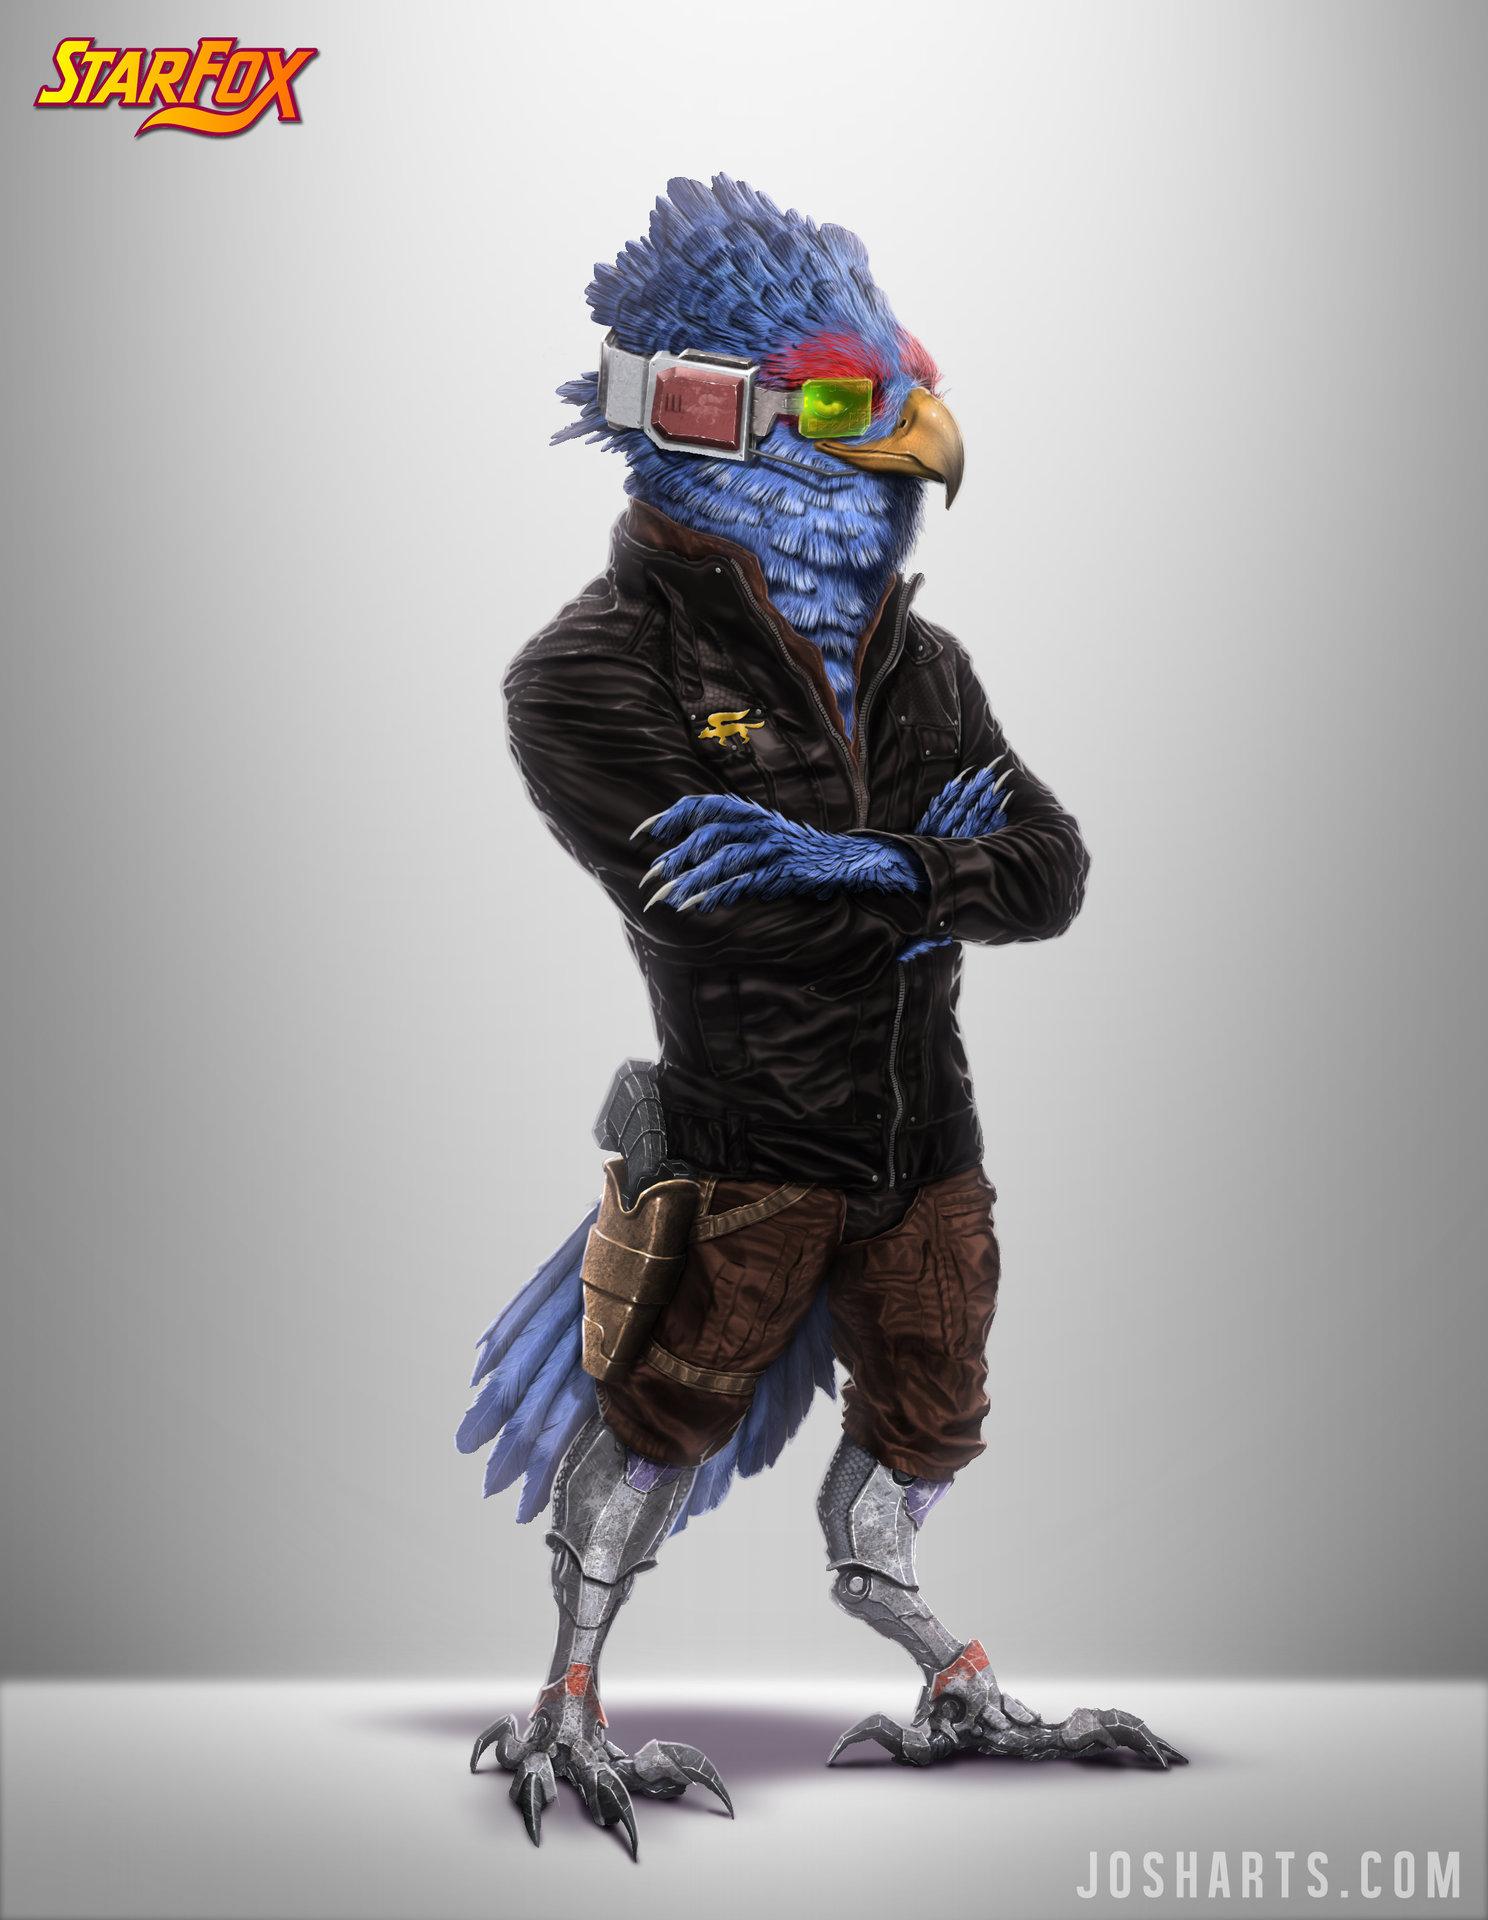 Josh matts char falco visor